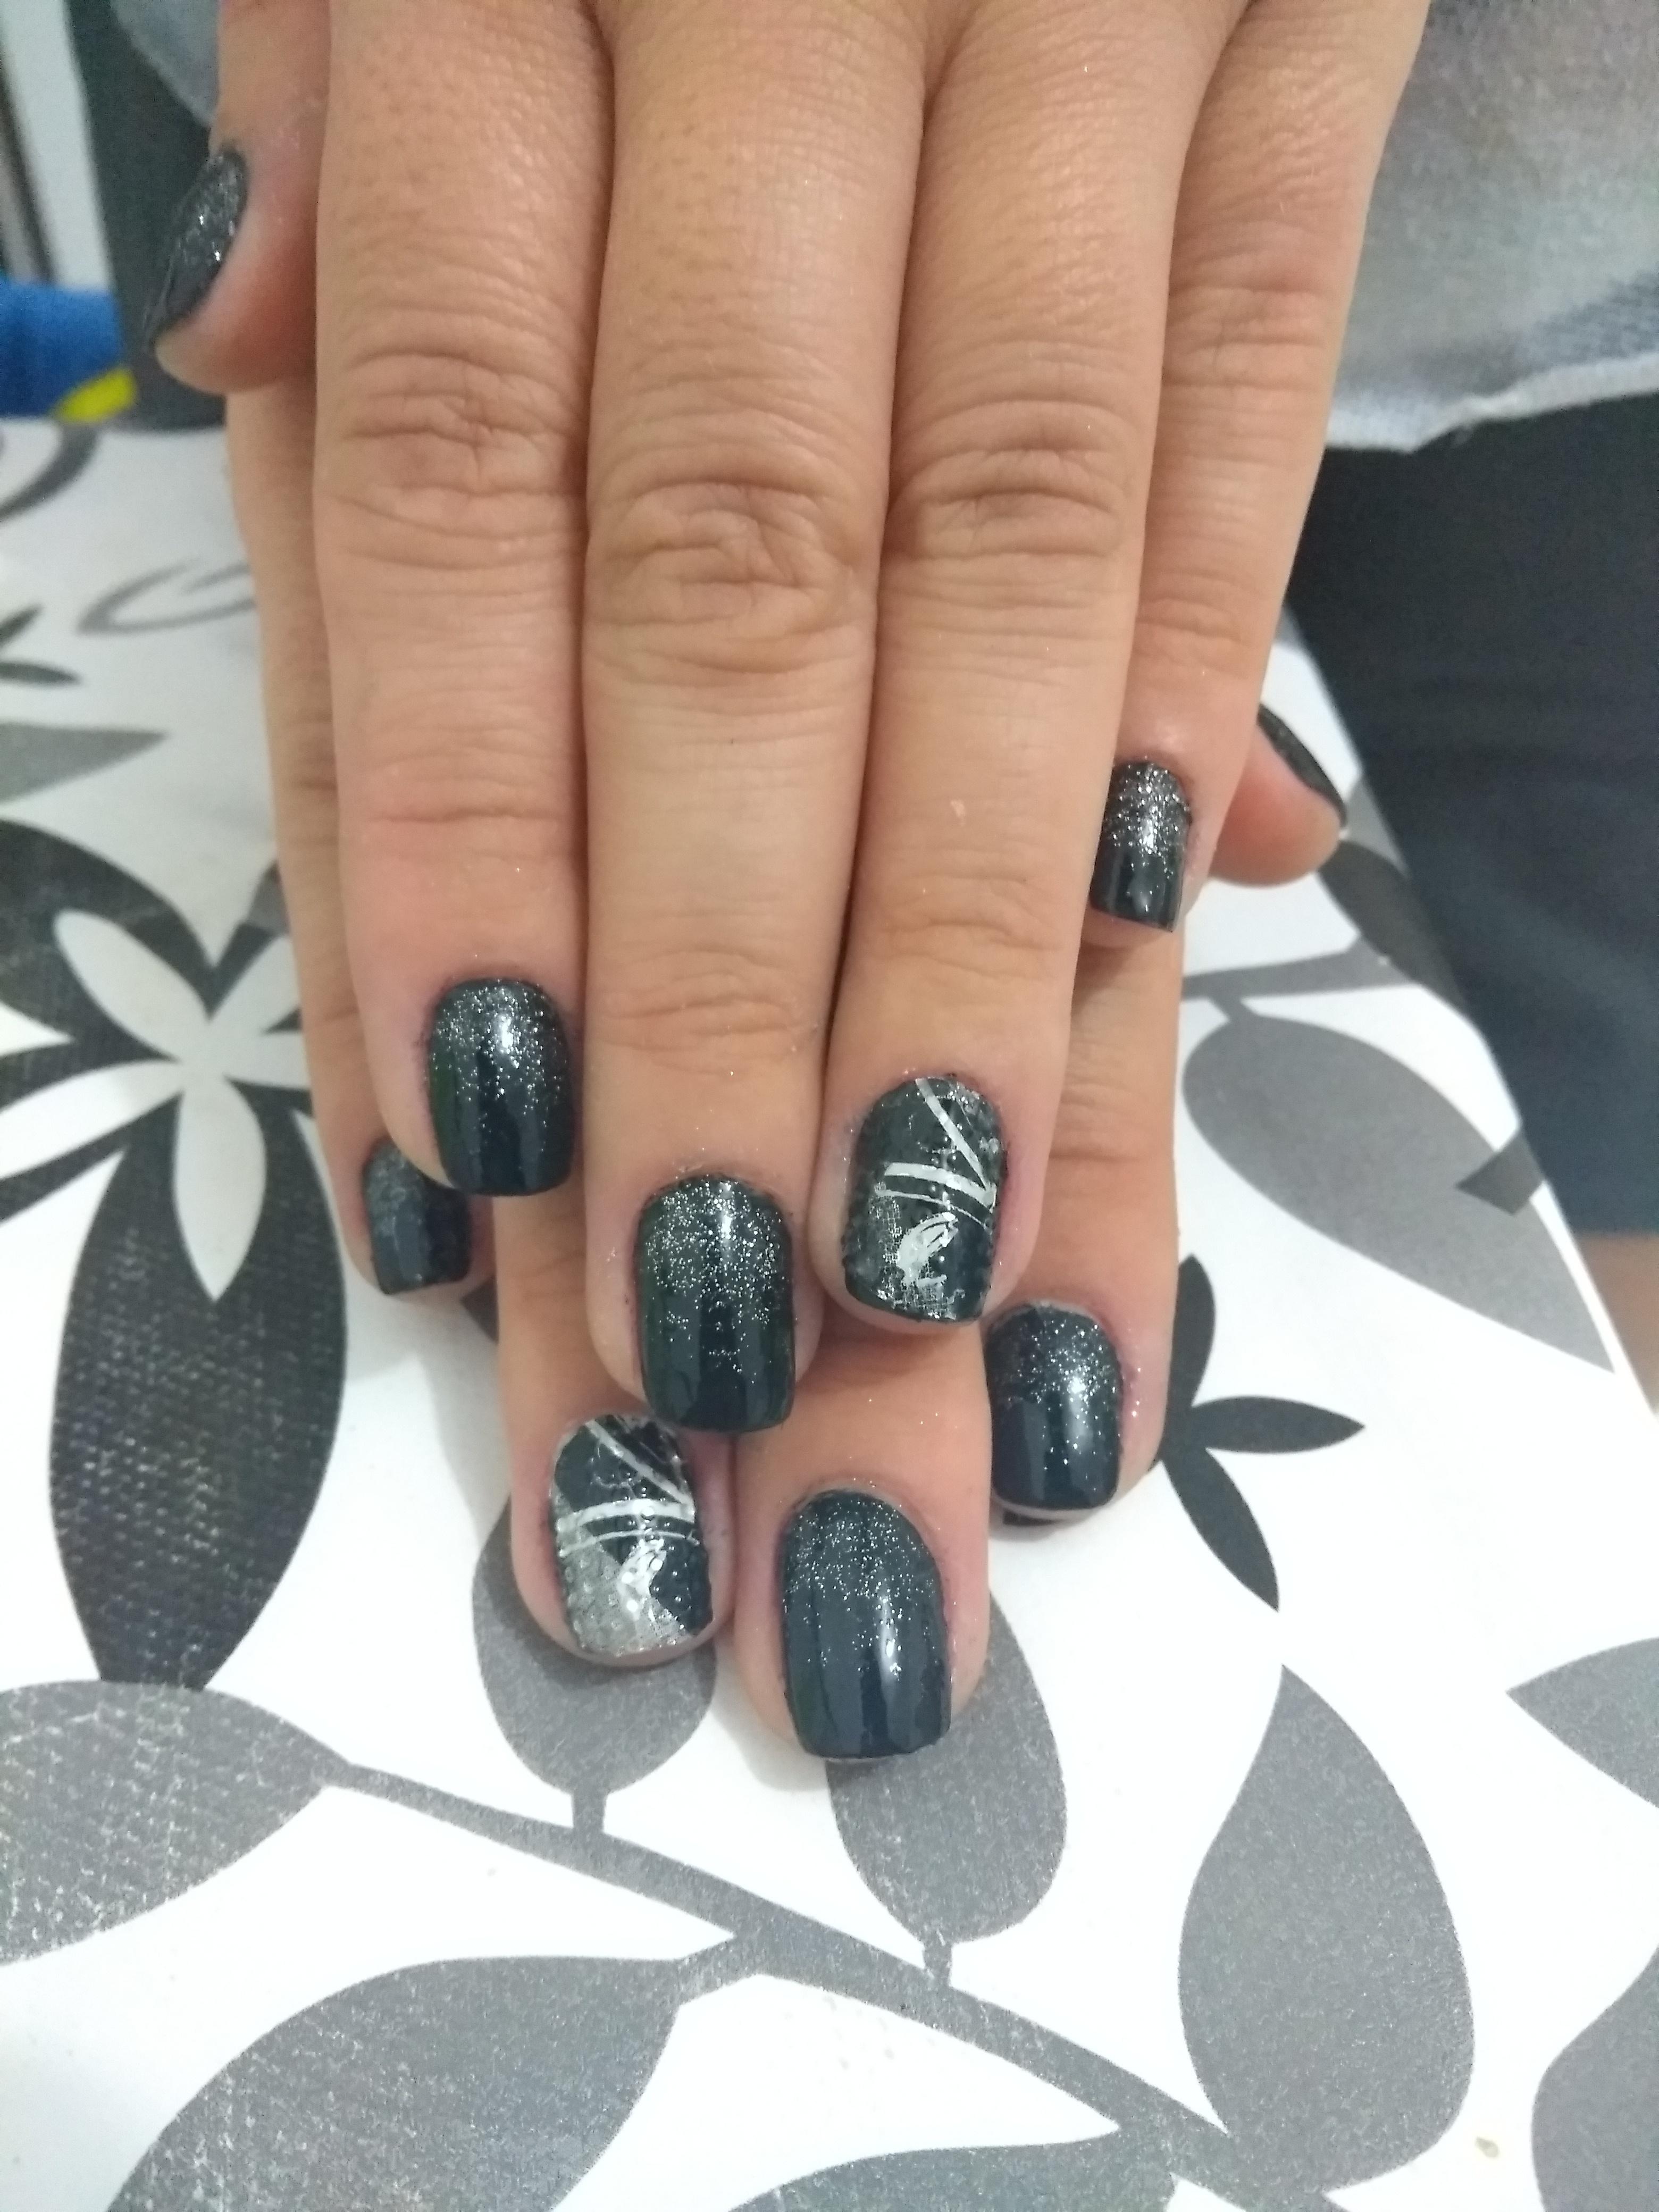 #nails #avonesmaltes #colortrend unha auxiliar cabeleireiro(a) auxiliar administrativo manicure e pedicure